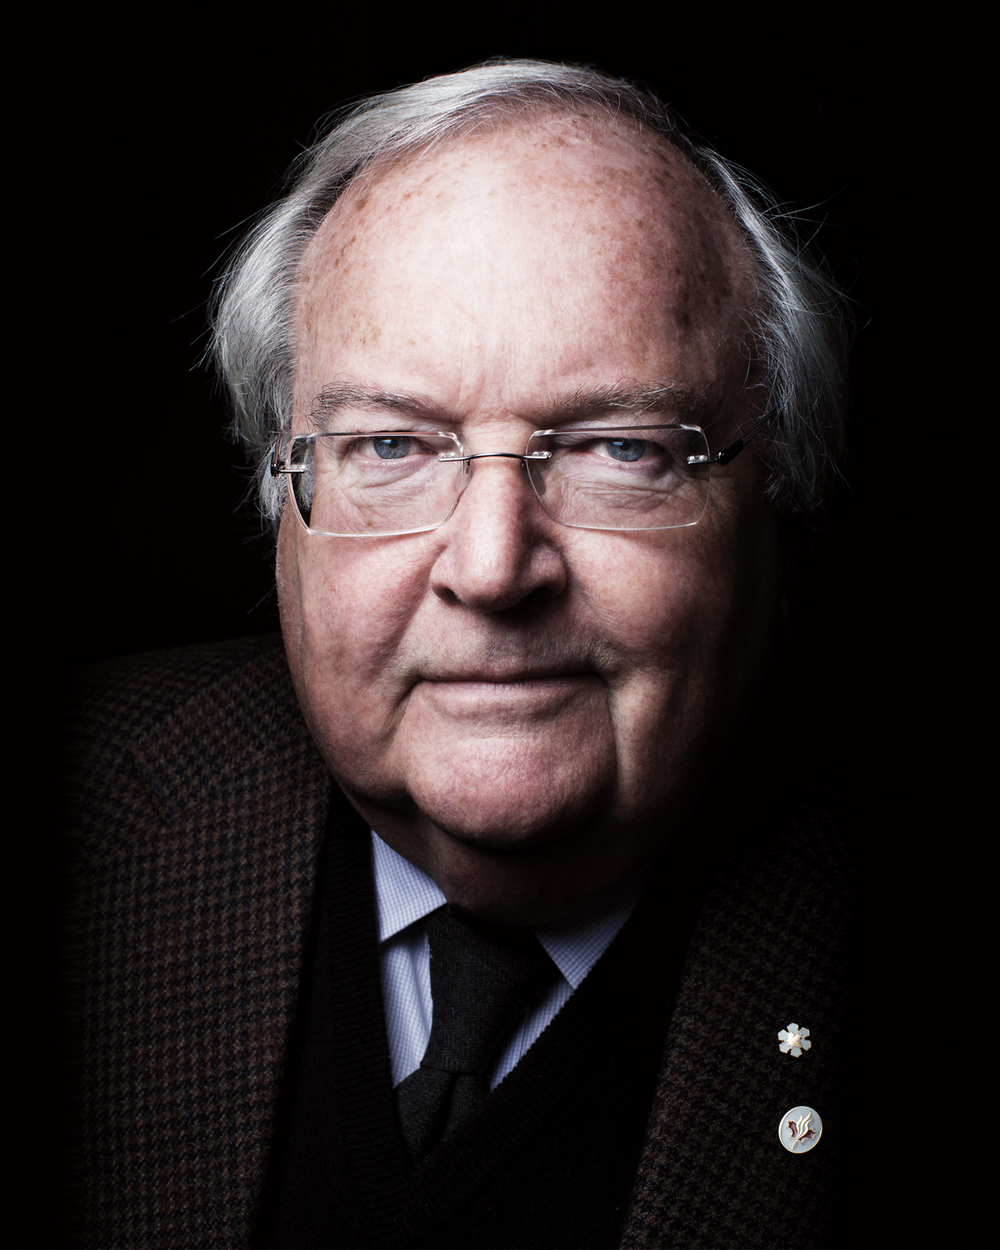 Richard Currie